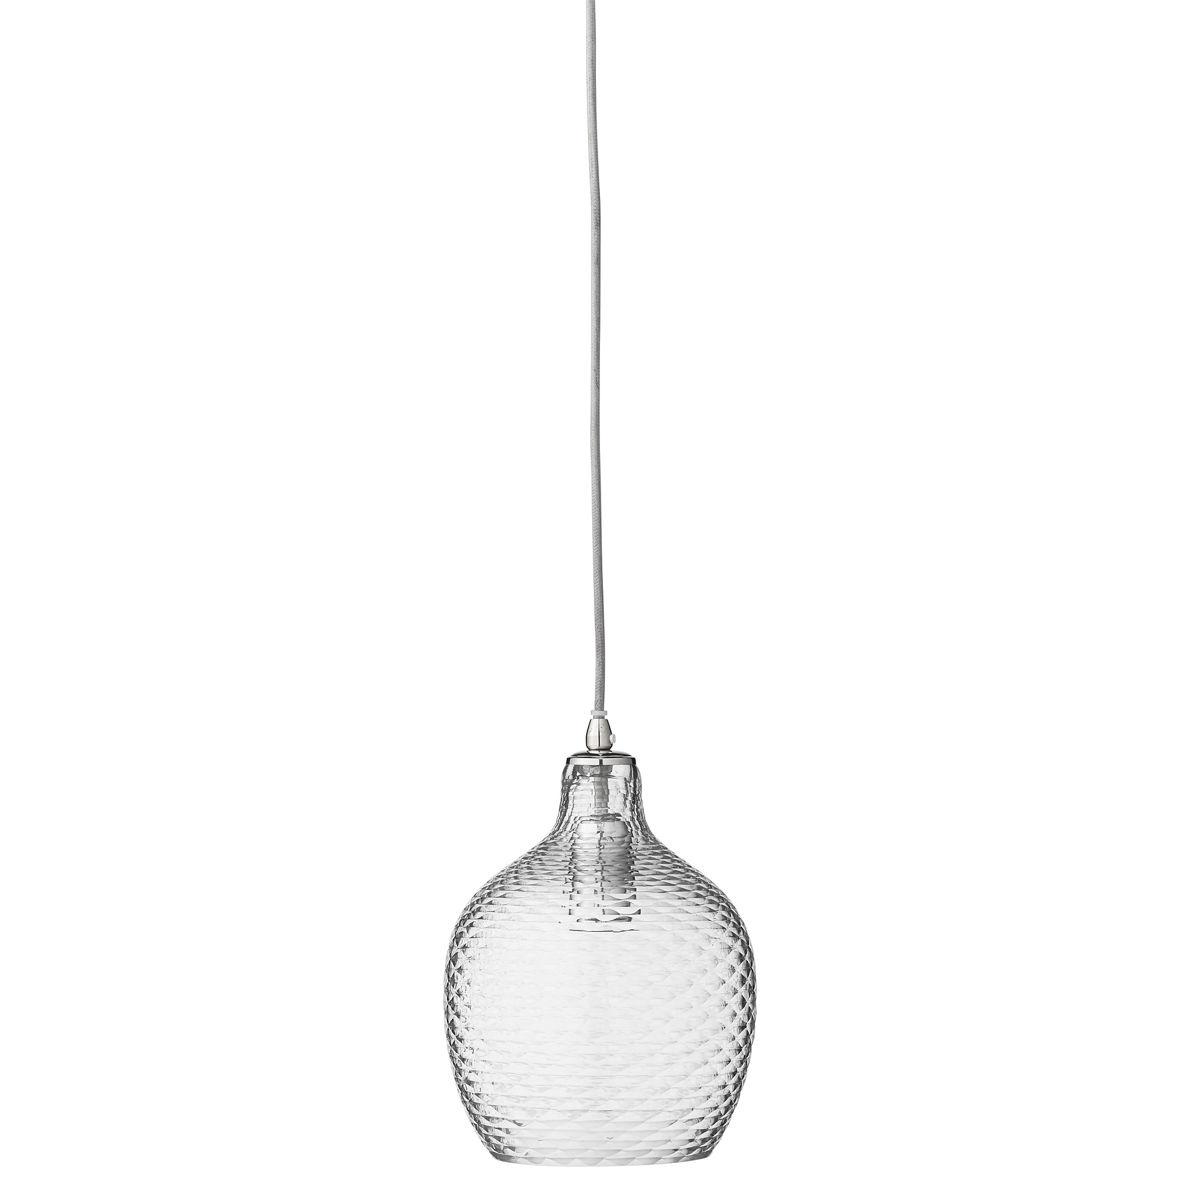 żyrandol Lampa Melba Pendant Clearsilver A00003135 Lene Bjerre